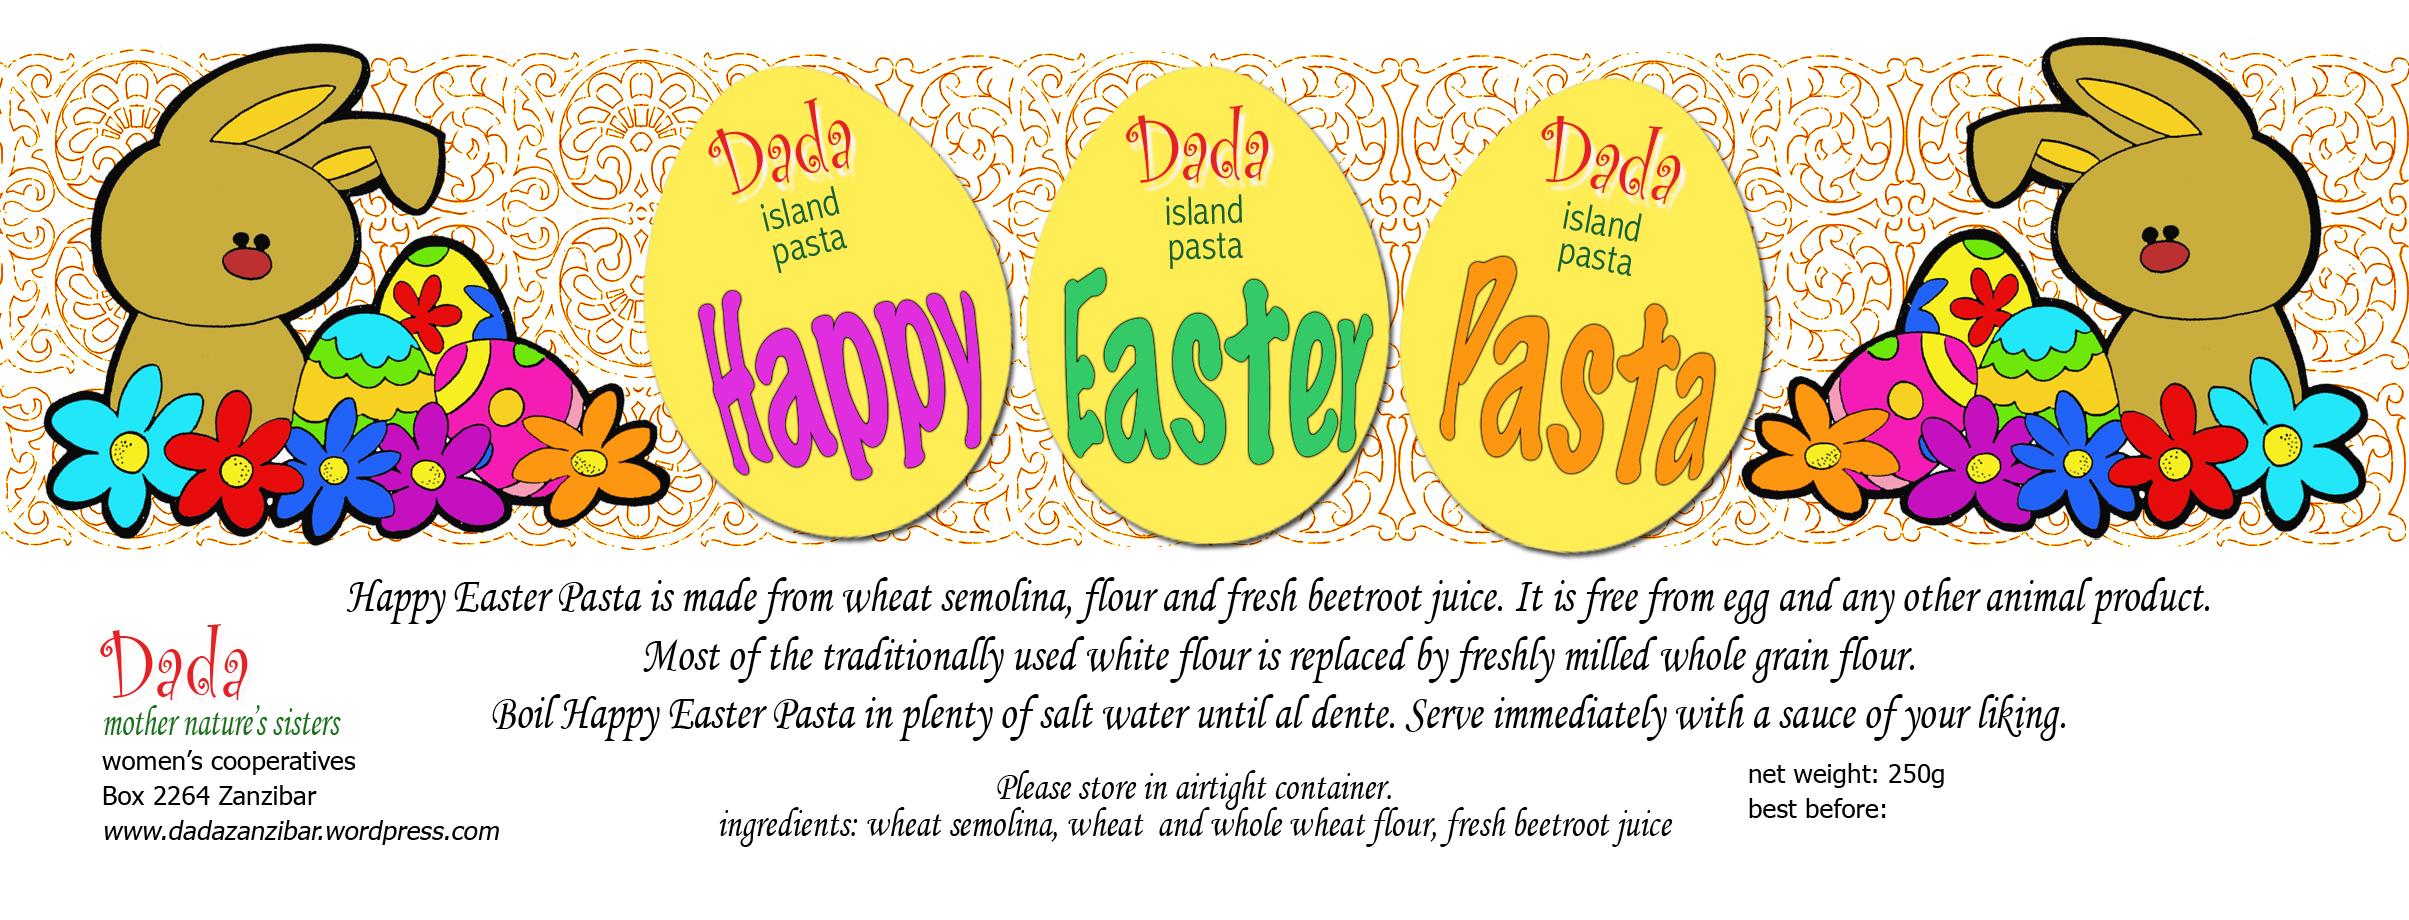 Happy Easter Monday 2